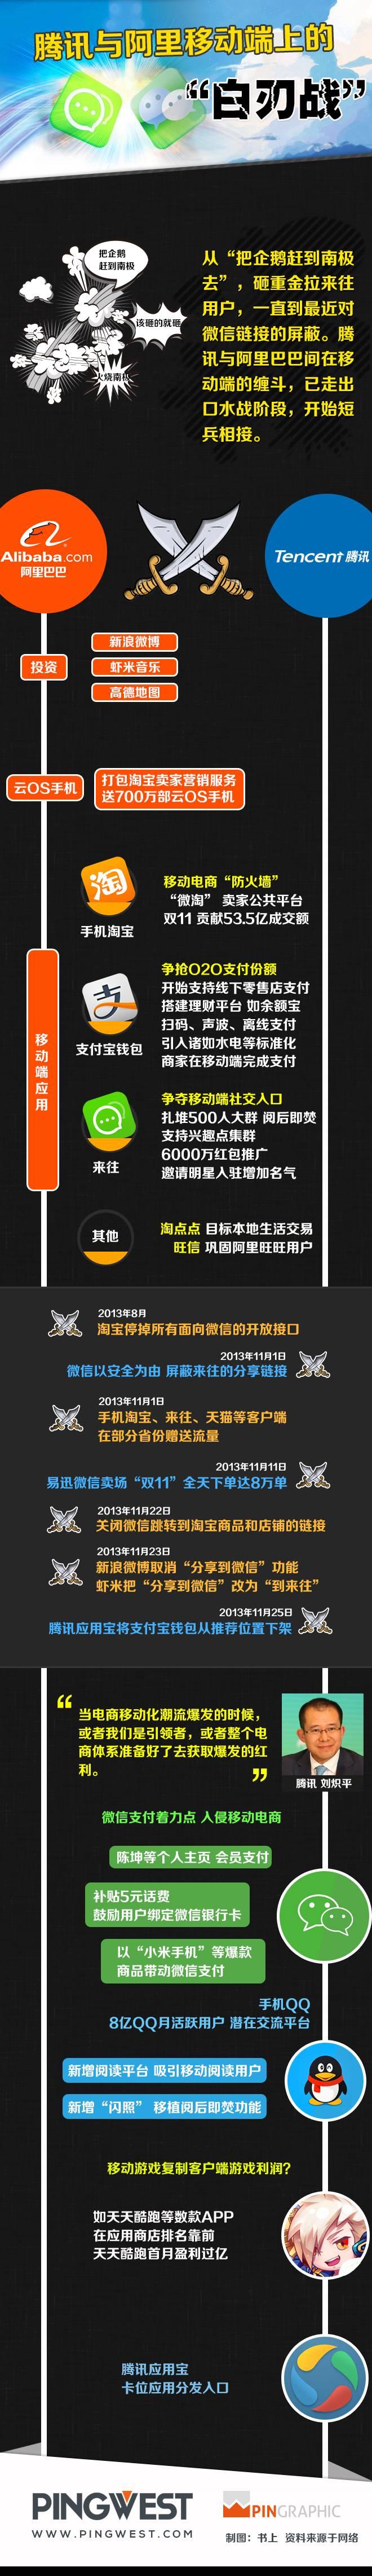 AlibabaVStencent4